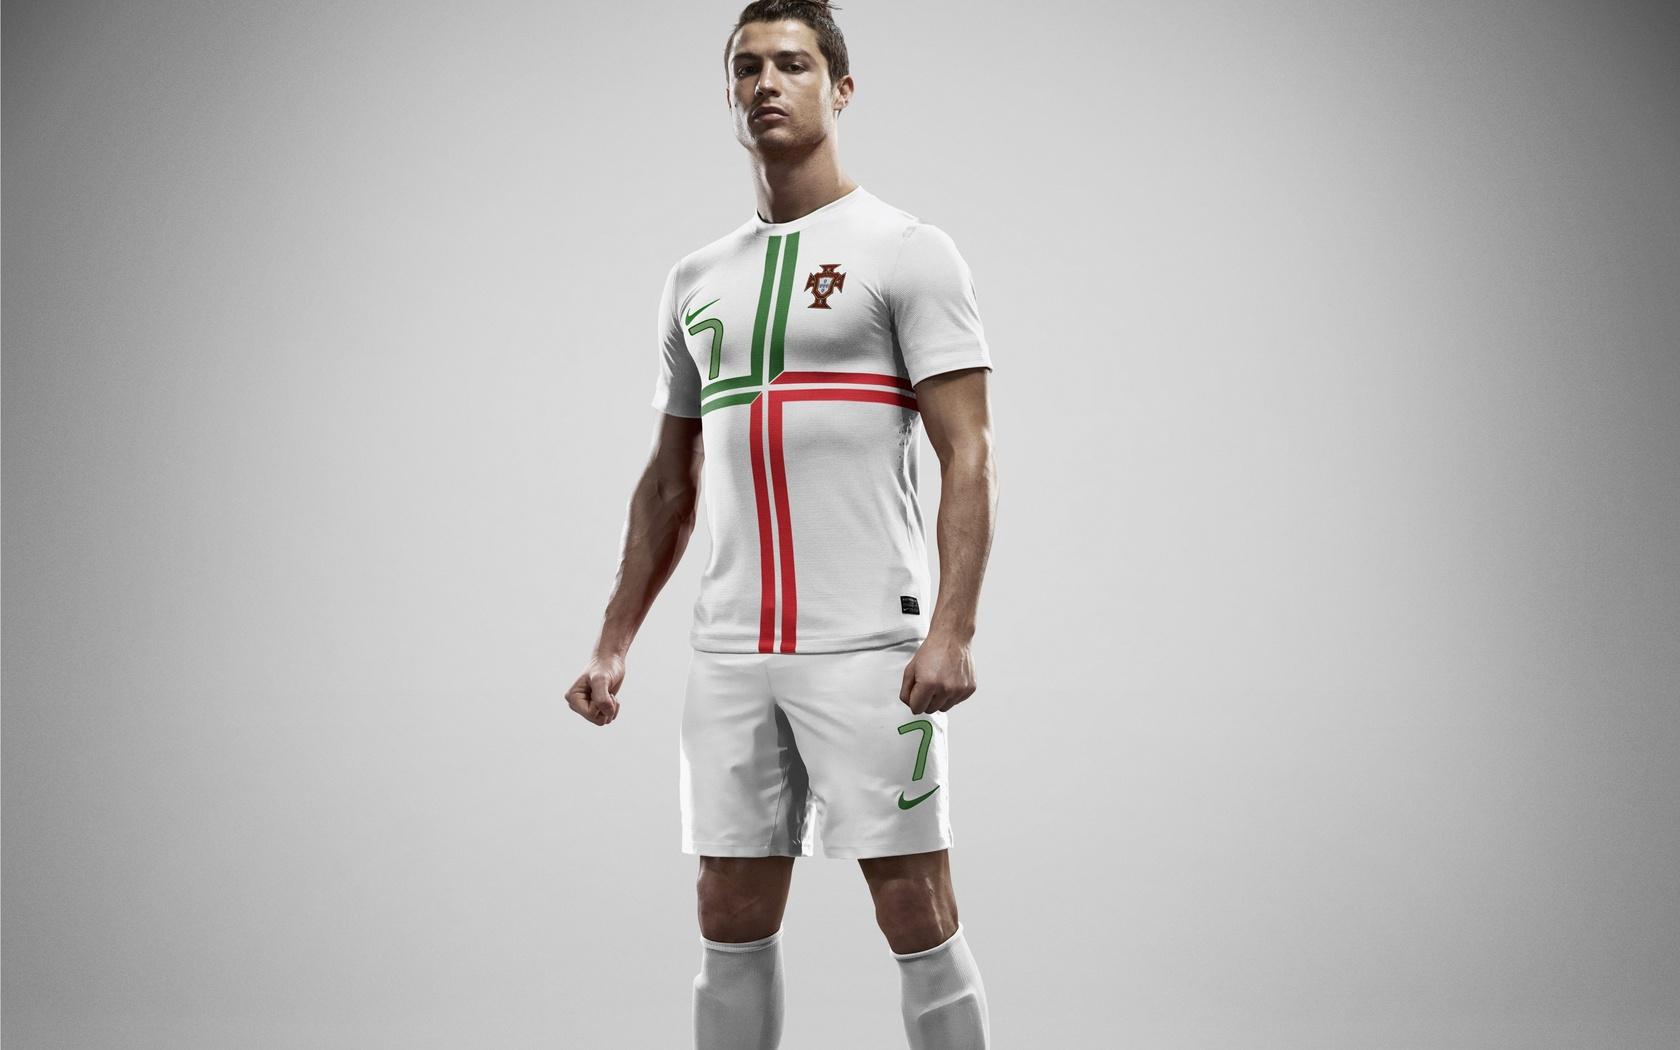 Download mobile wallpaper People, Sports, Football, Men, Cristiano Ronaldo for free.